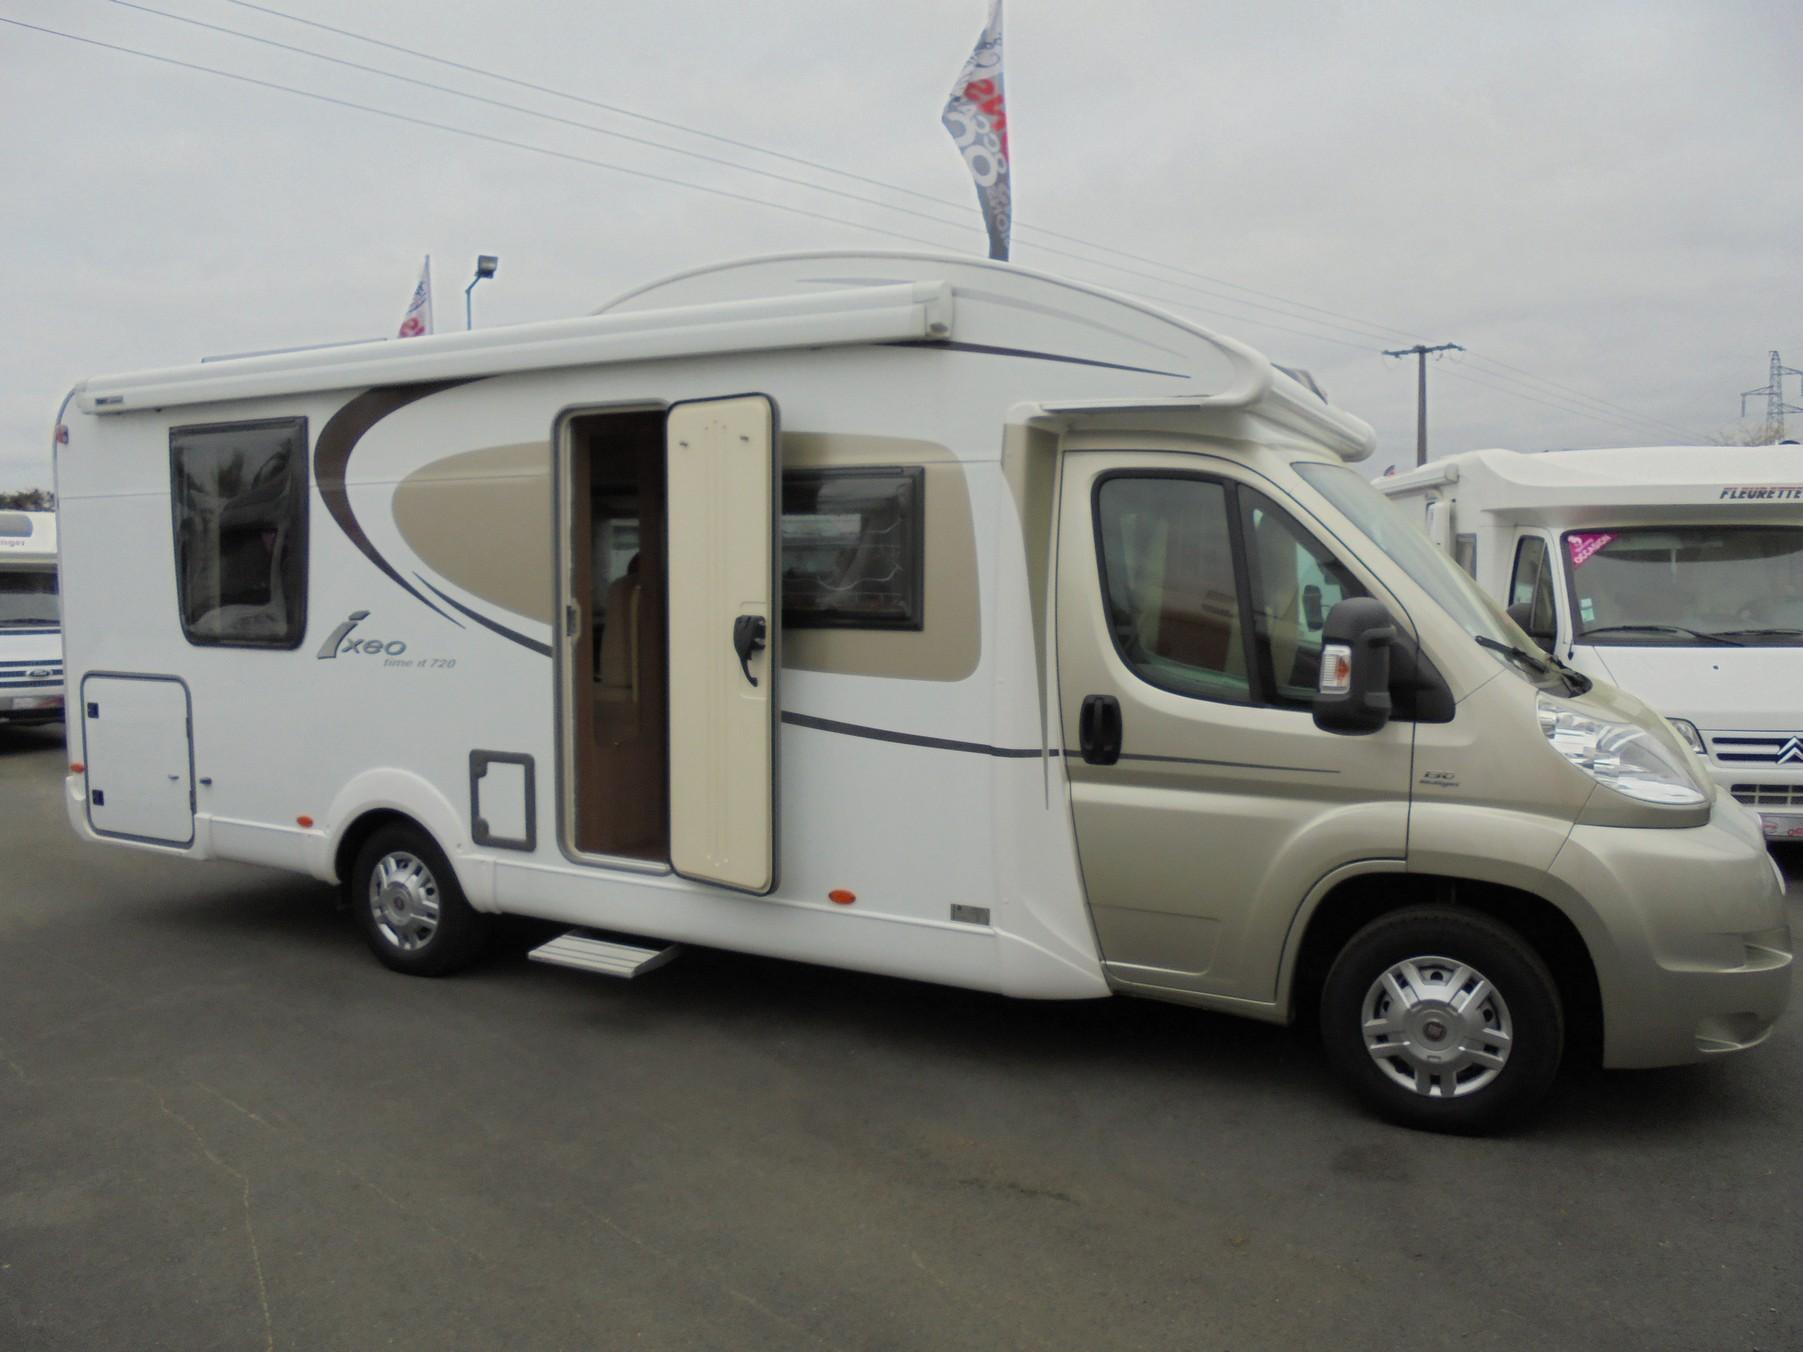 burstner ixeo time it 720 occasion de 2011 fiat camping car en vente treillieres loire. Black Bedroom Furniture Sets. Home Design Ideas